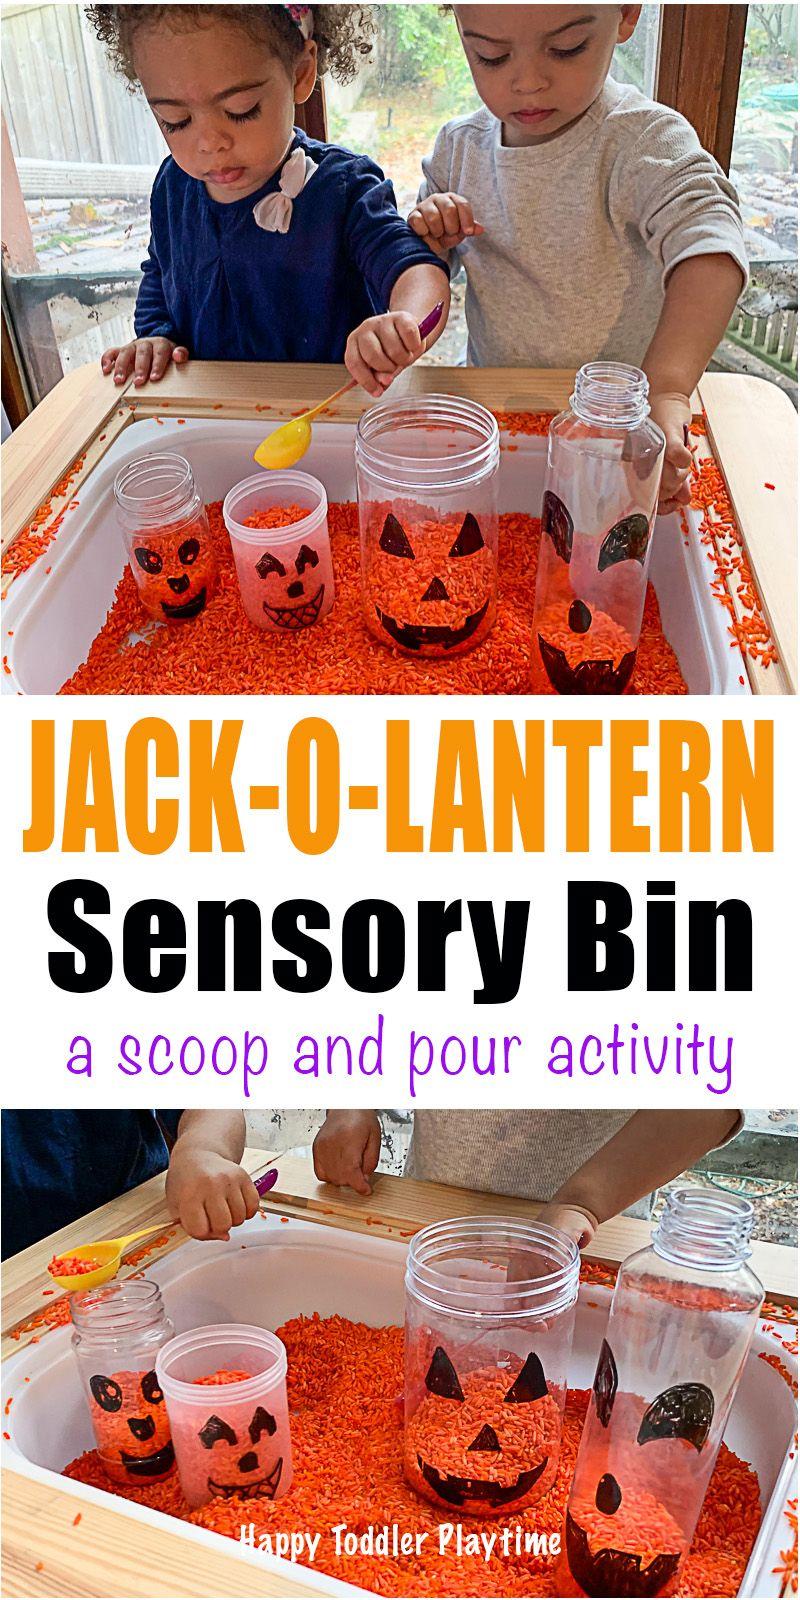 Photo of Jack-o-Lantern Sensory Bin for Toddlers – HAPPY TODDLER PLAYTIME